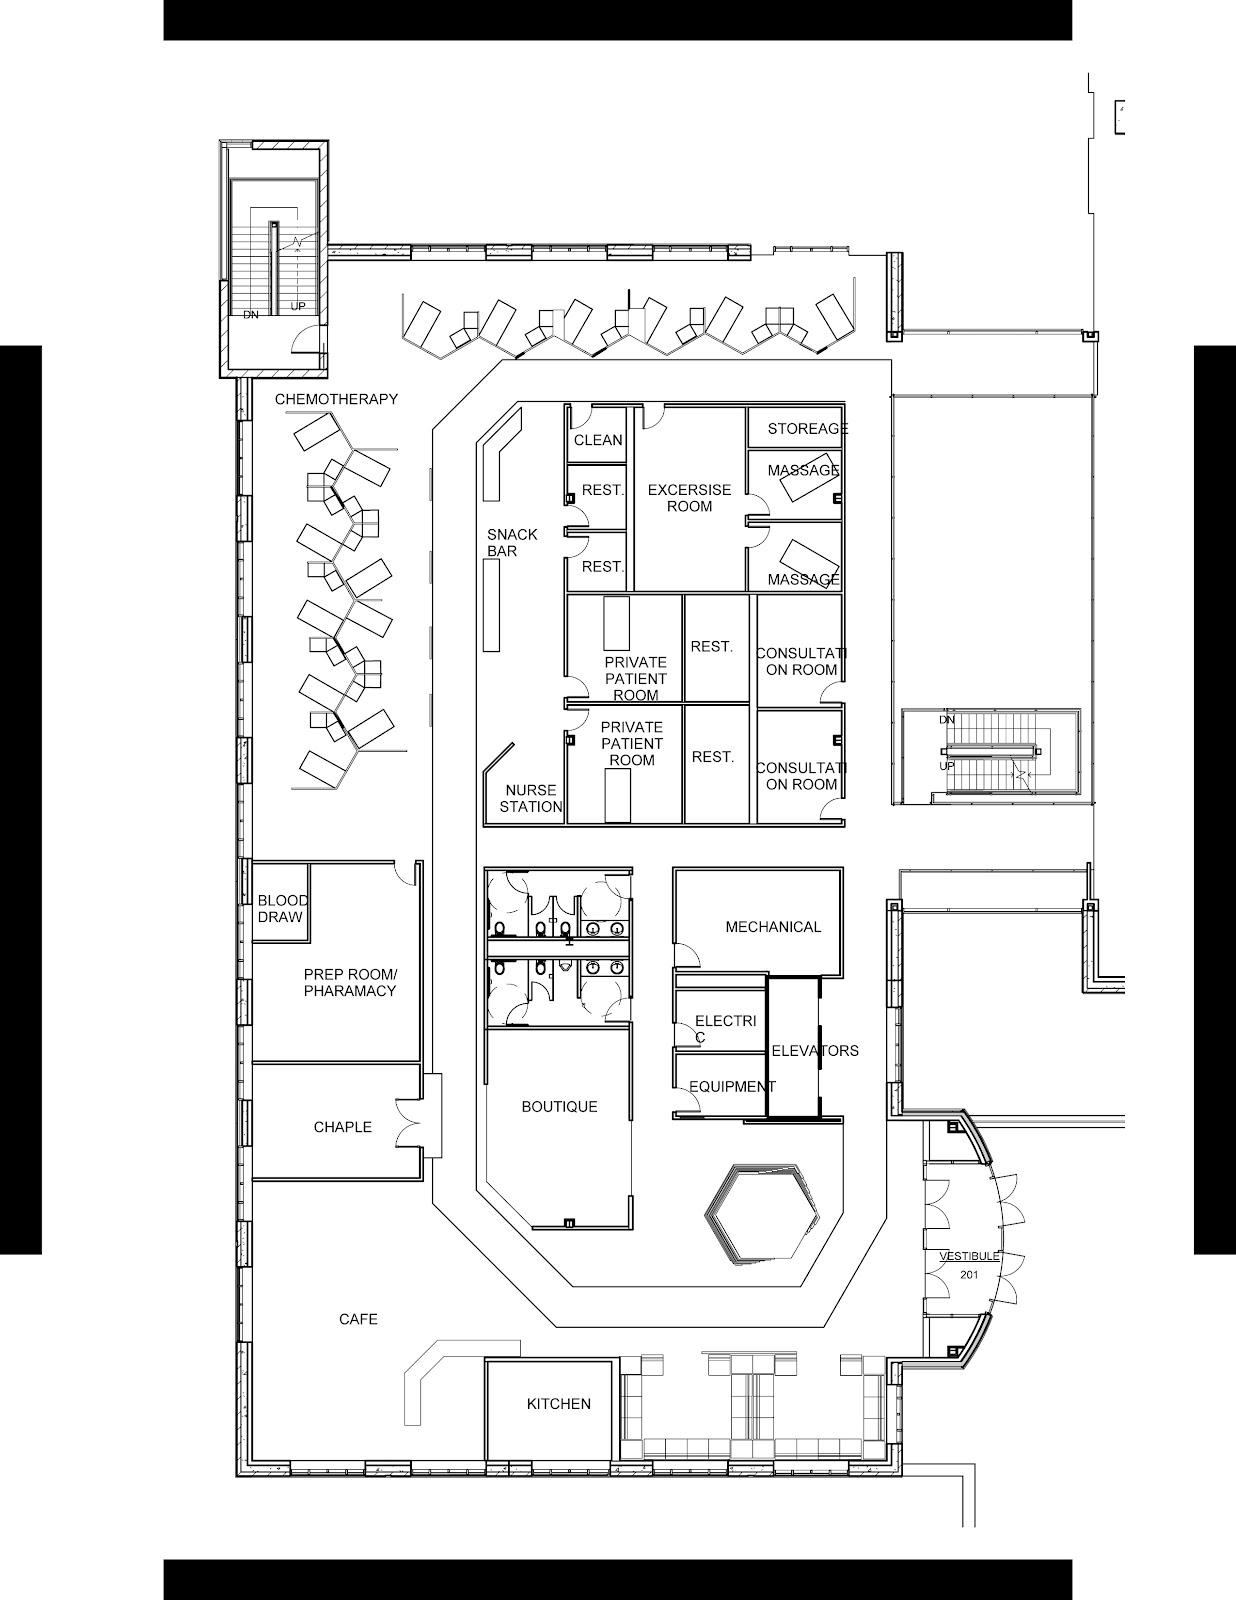 Chemotherapy Room Design: DESIGN-AWAY